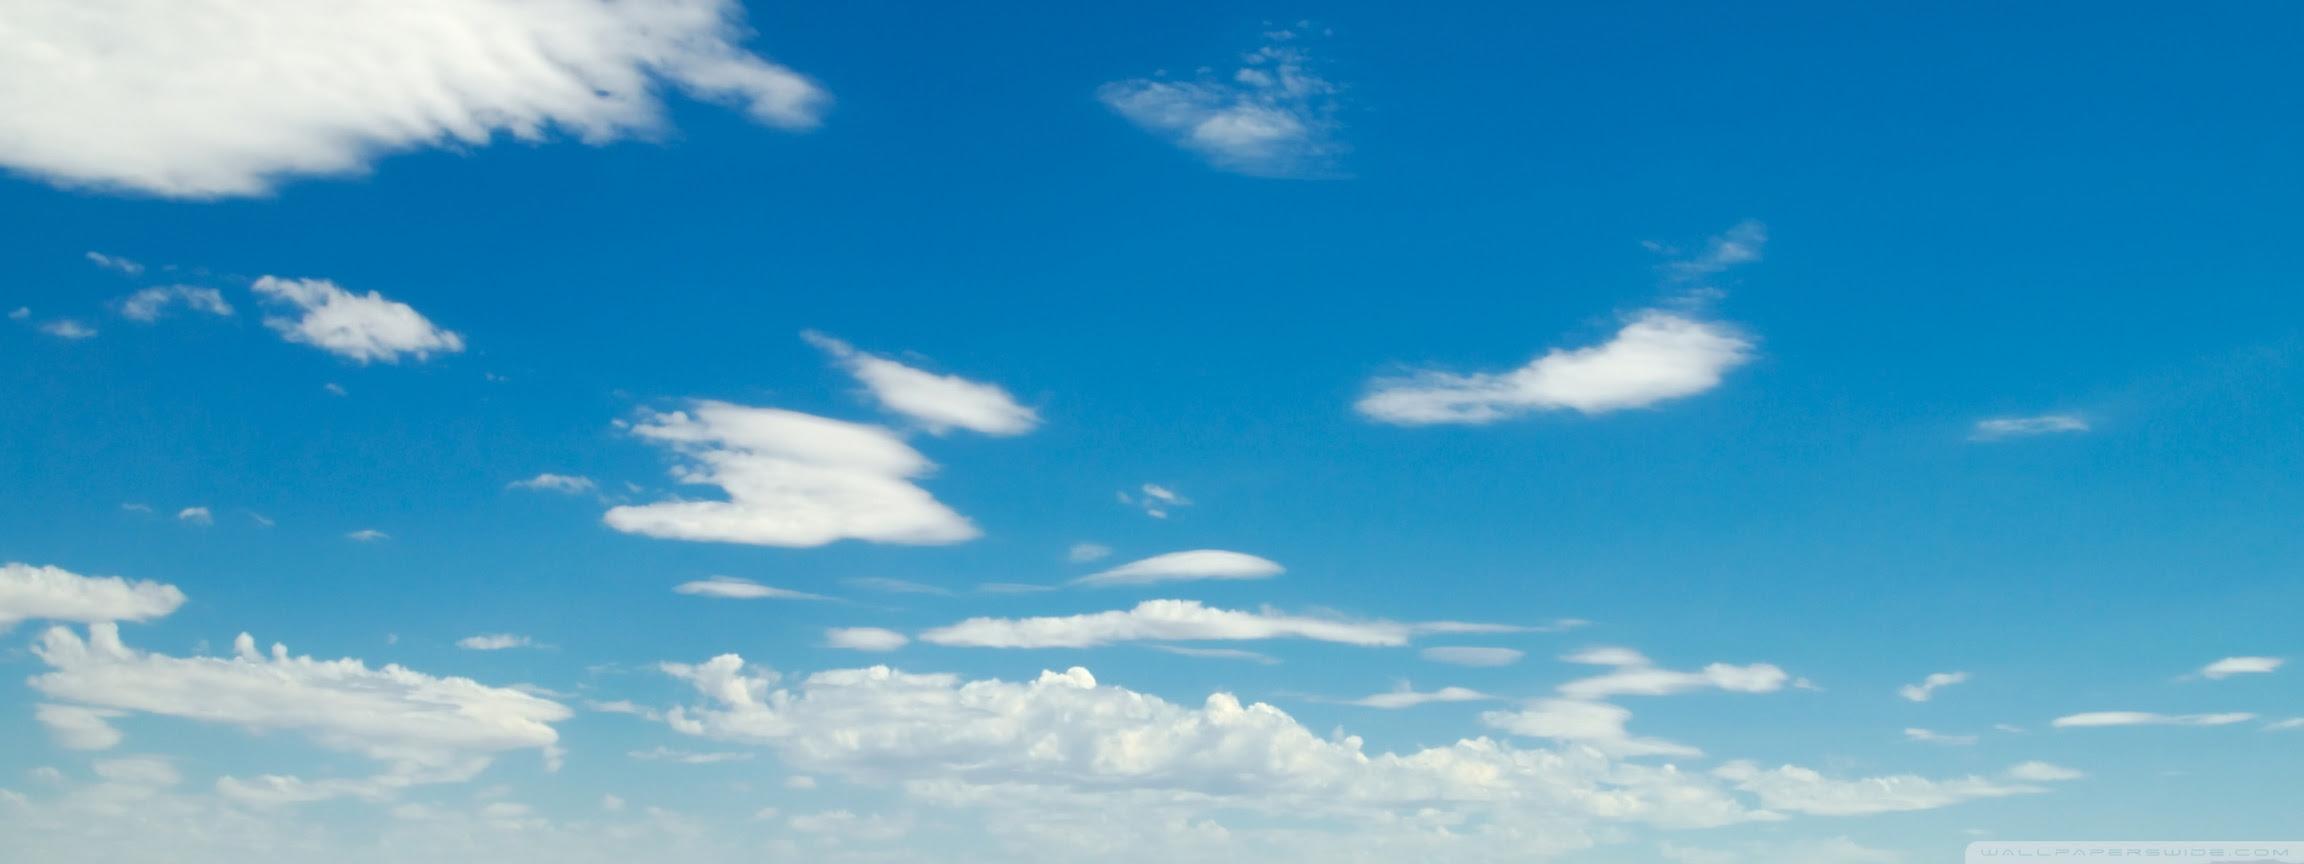 5000+ Wallpaper Abyss Sky  Gratis